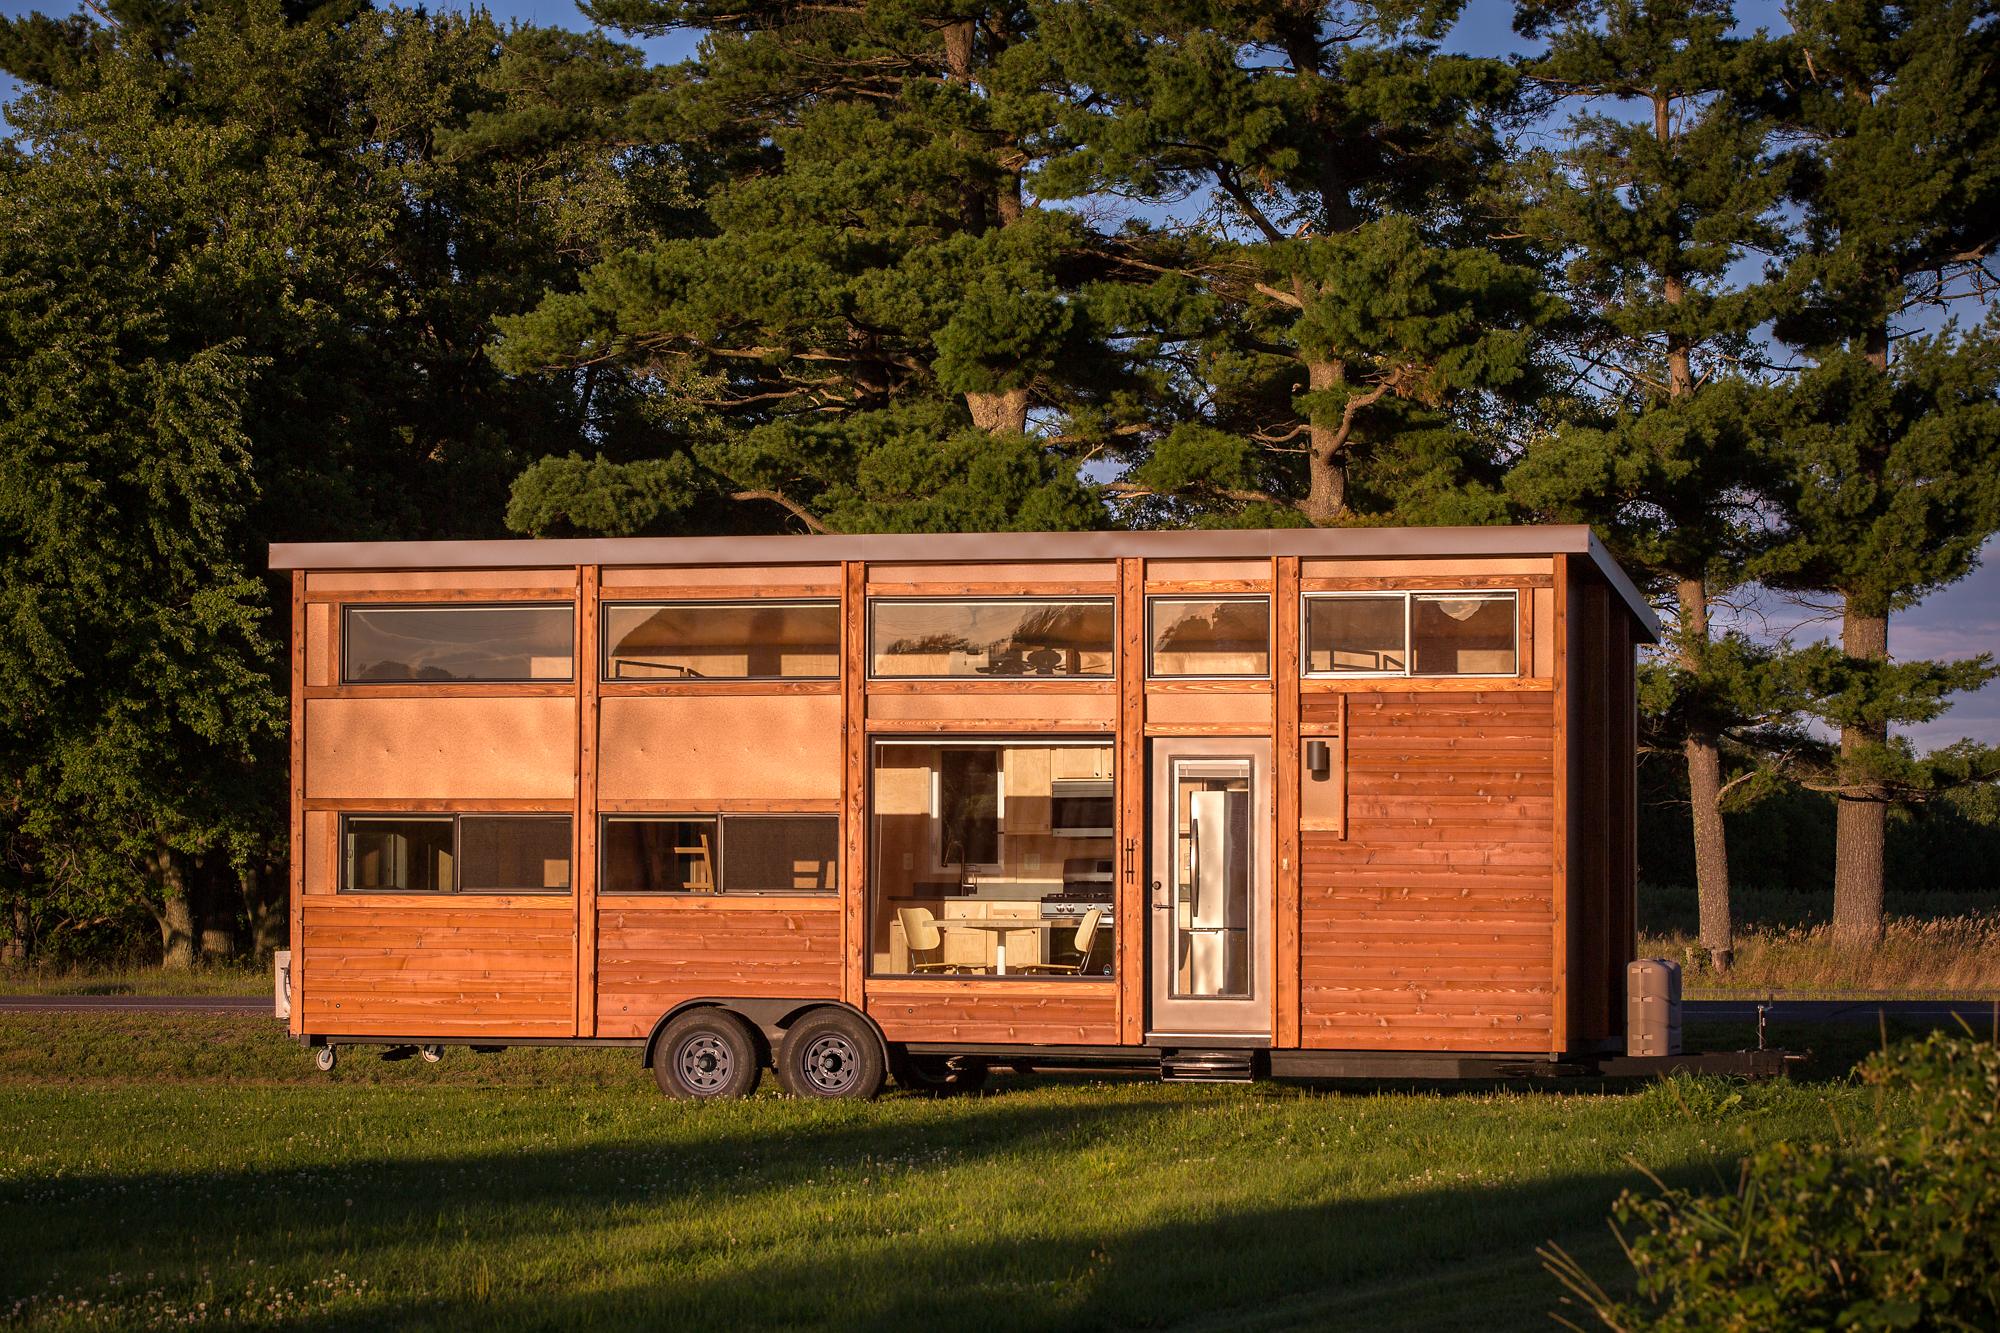 Tiny wood home on wheels